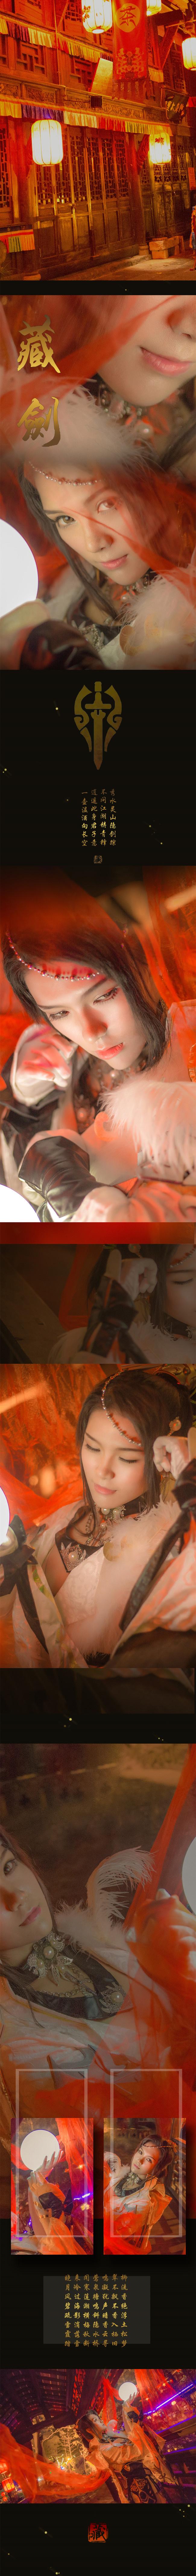 【cos正片】剑网3——藏剑·破虏二小姐 cn:寒殇 cosplay-第4张